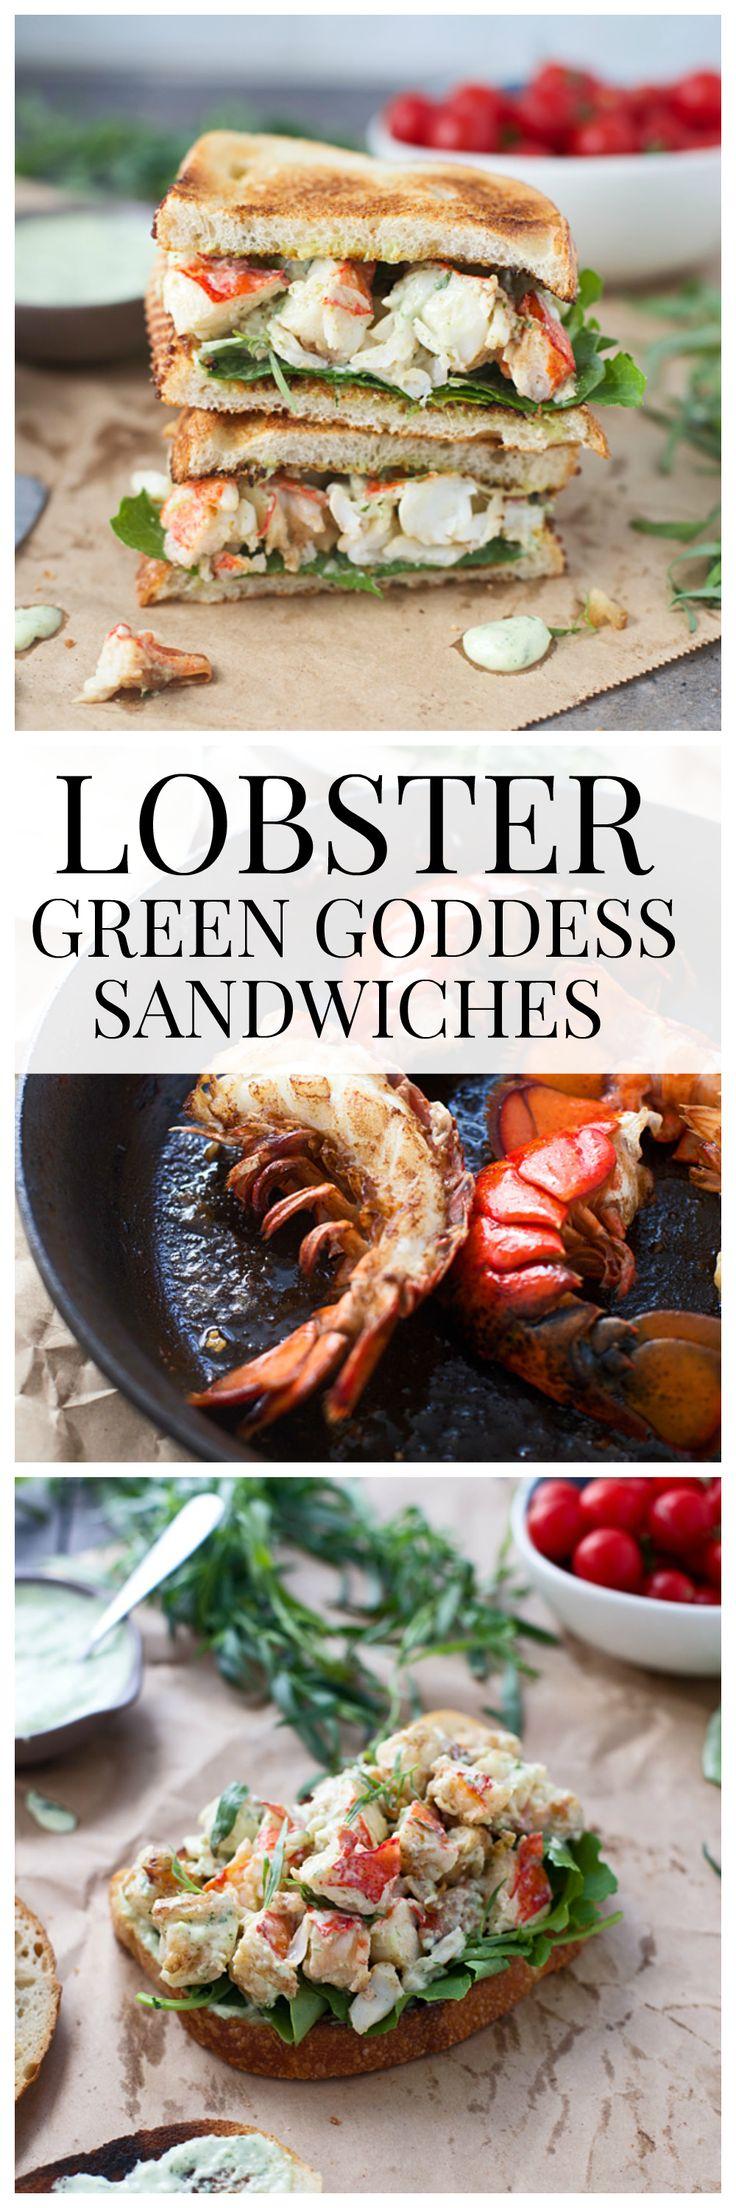 Green Goddess Lobster Sandwiches                                                                                                                                                                                 More